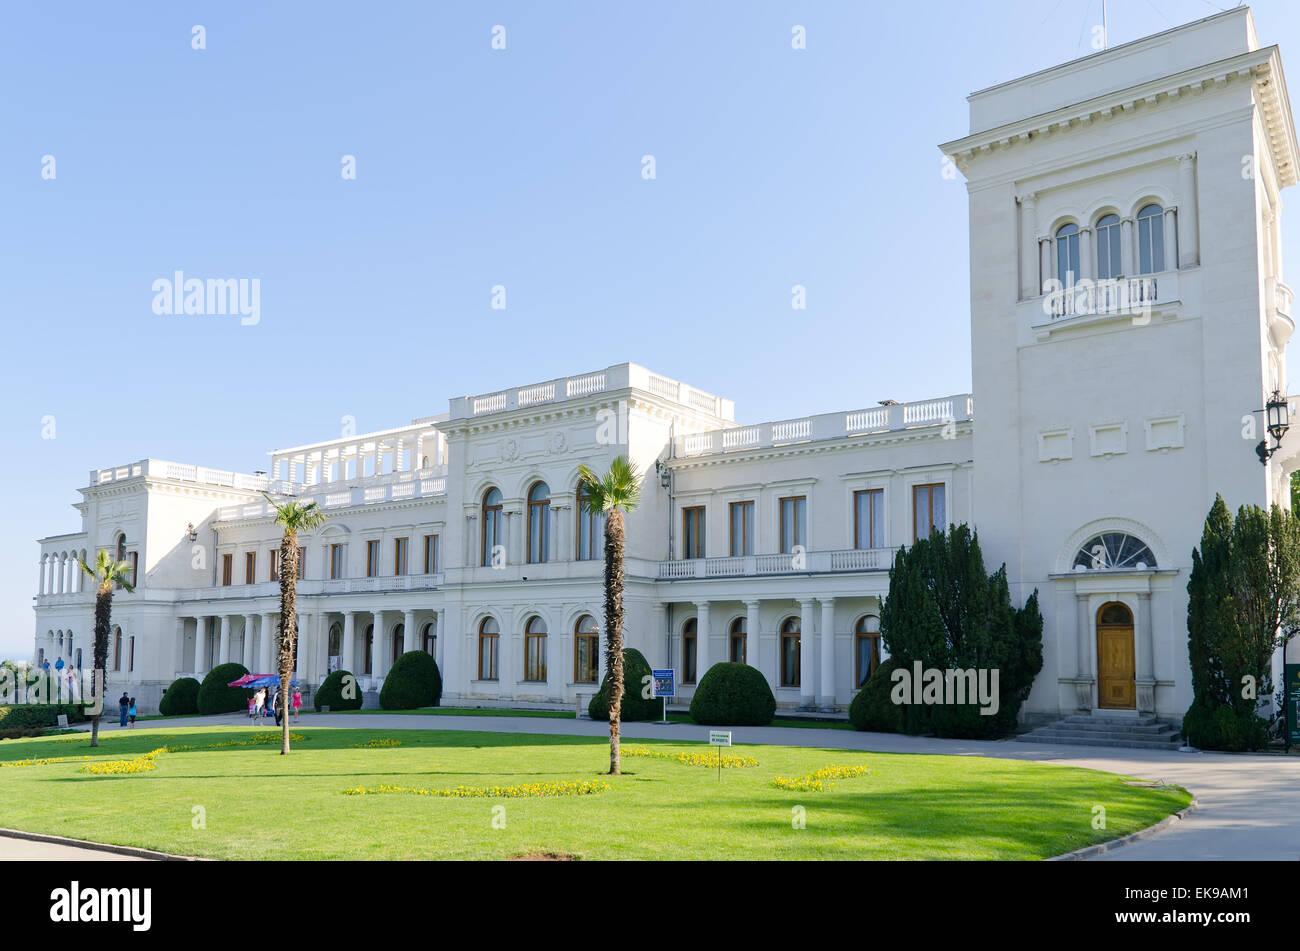 Livadia palace, Crimea, Ukraine - Stock Image